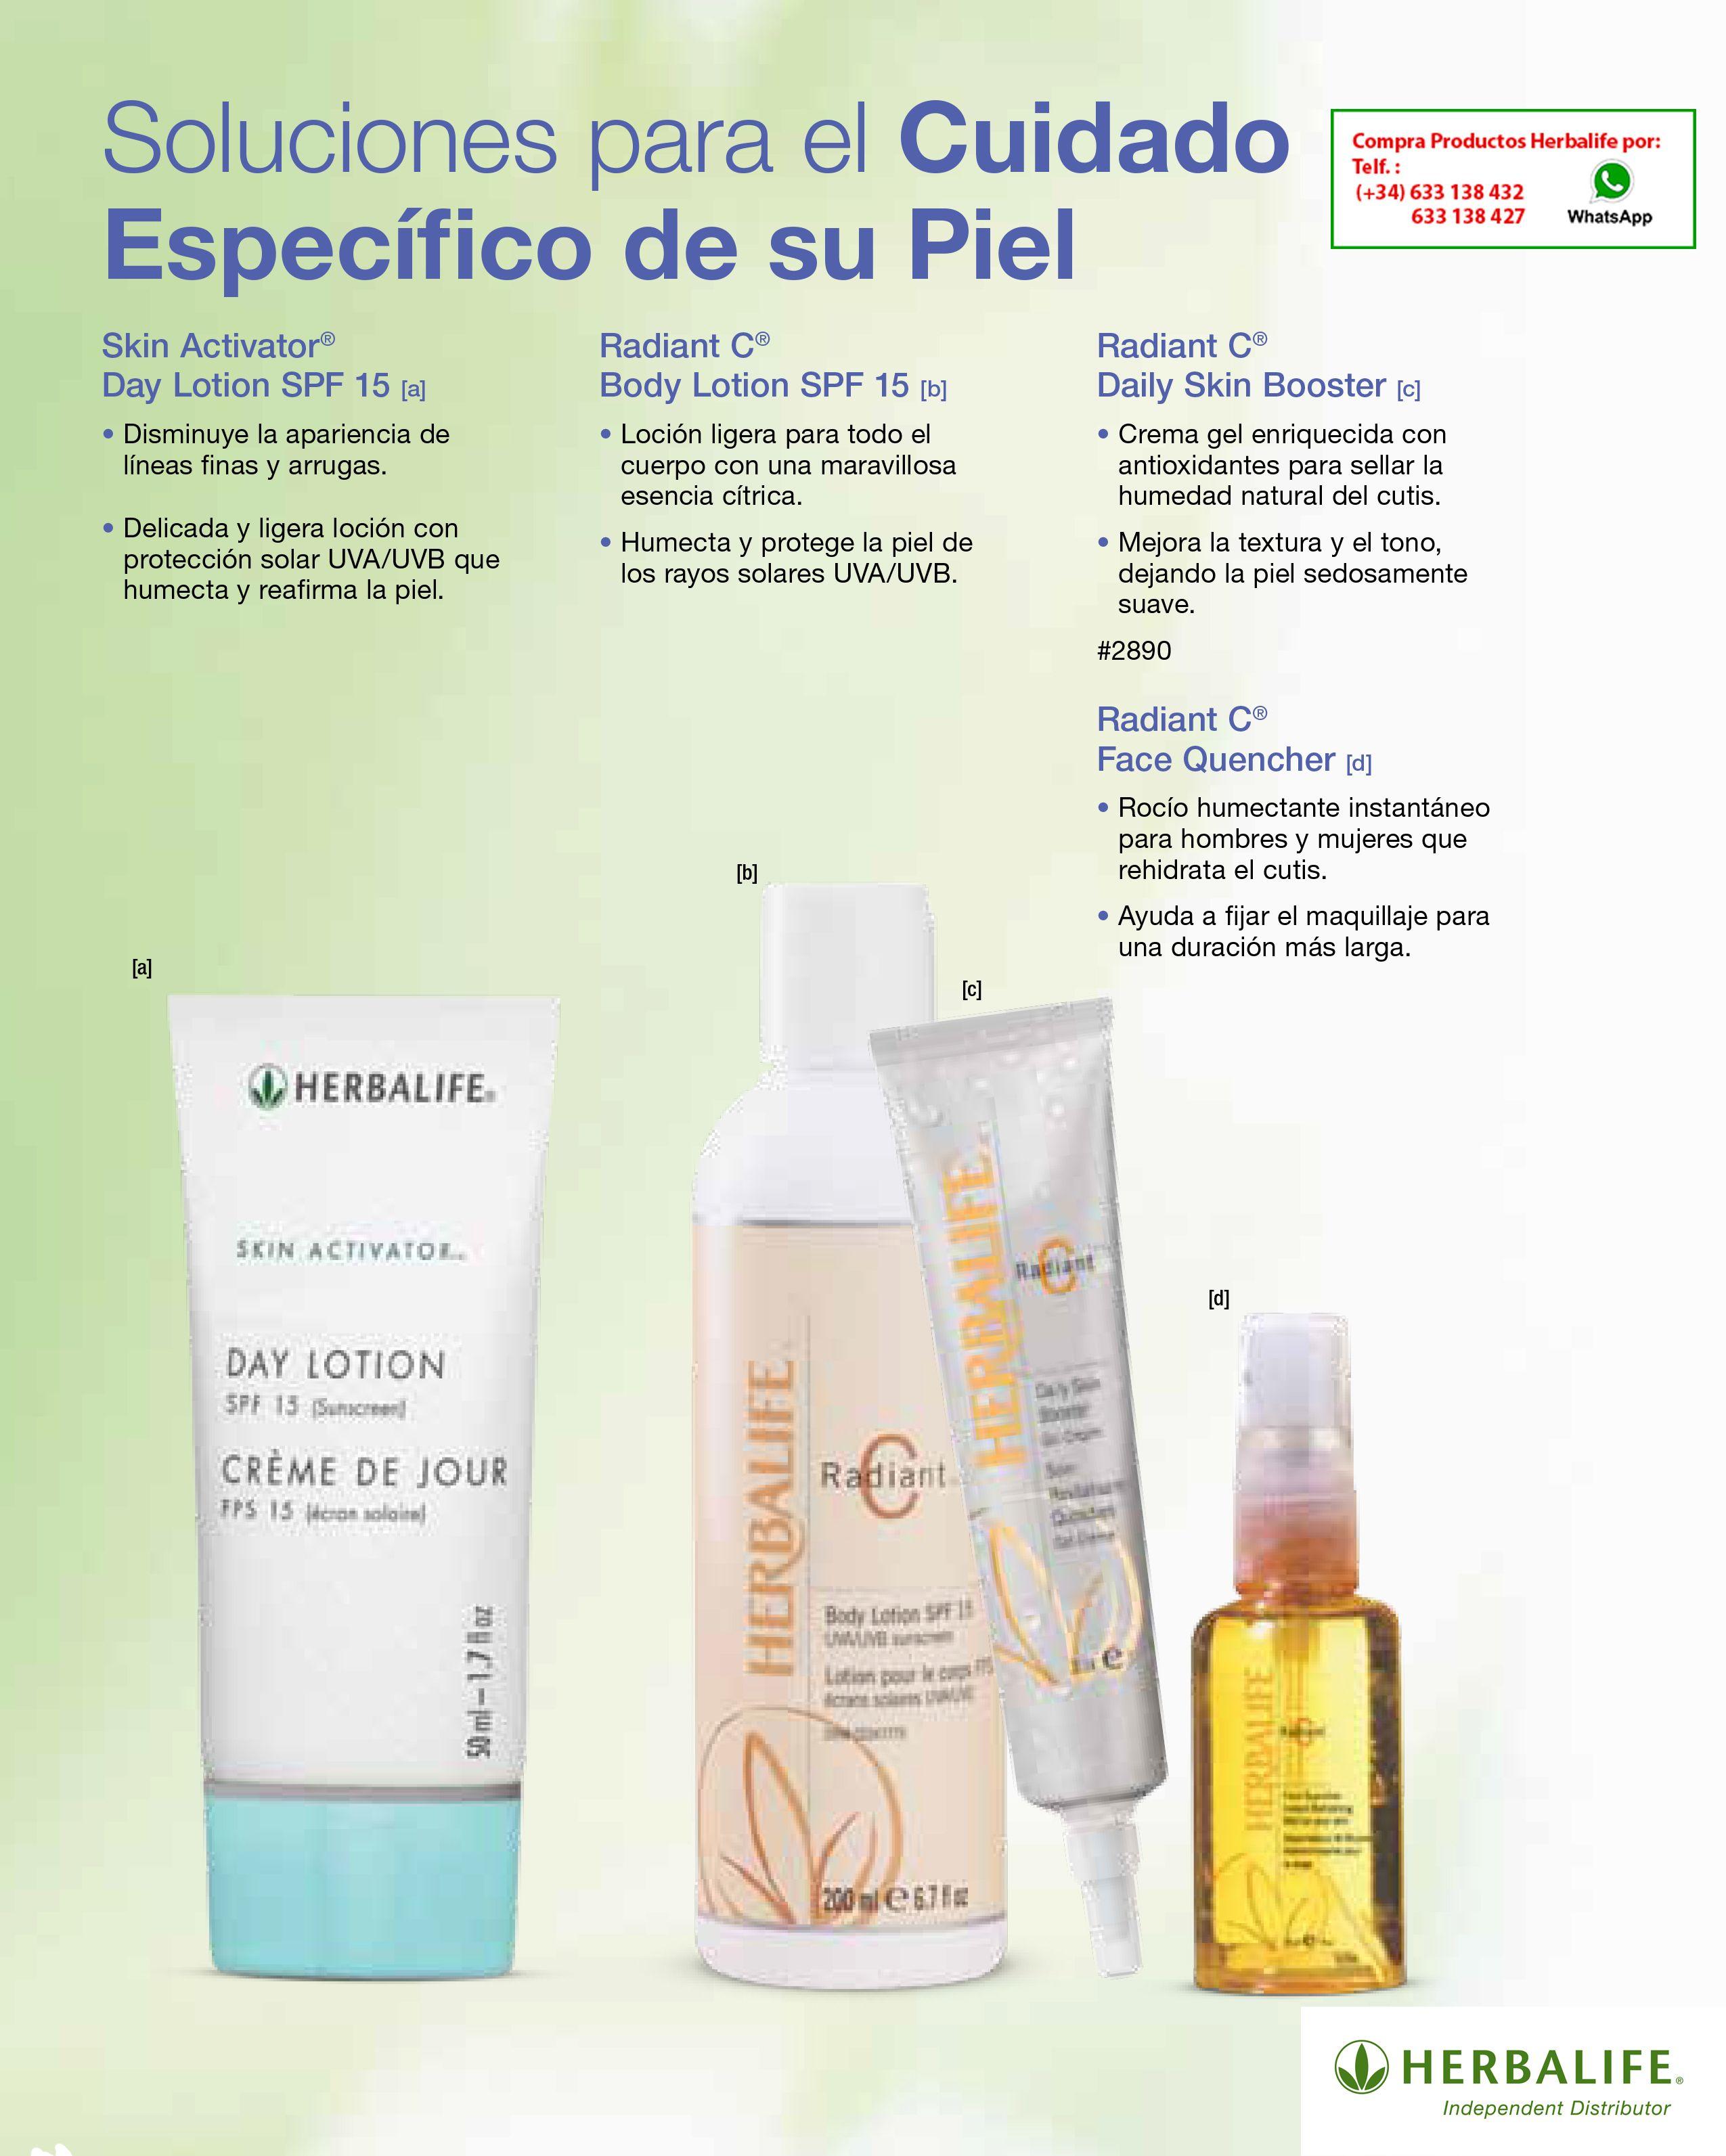 Care herbal life product skin - Explore Skin Care Herbalife And More